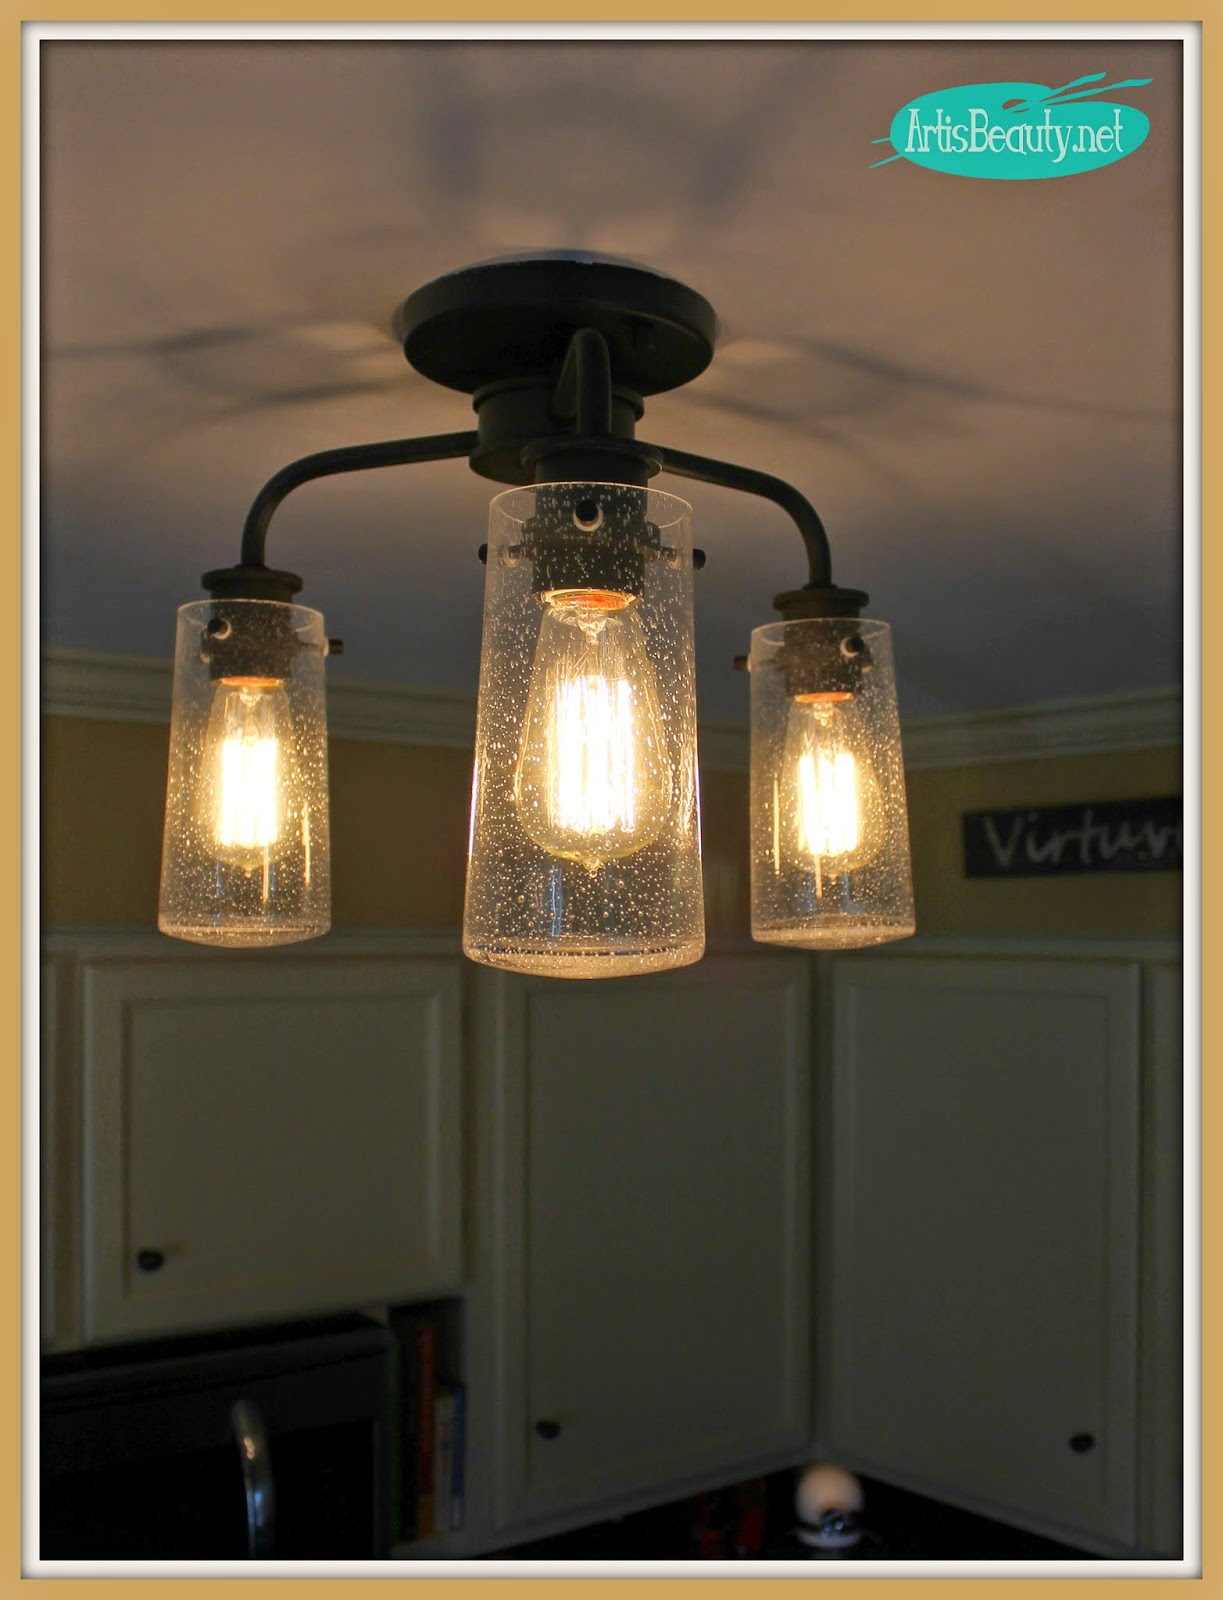 vintage style kitchen lighting. ART IS BEAUTY: Vintage Style Kitchen Lighting Update! Buh Bye Boob Light! U